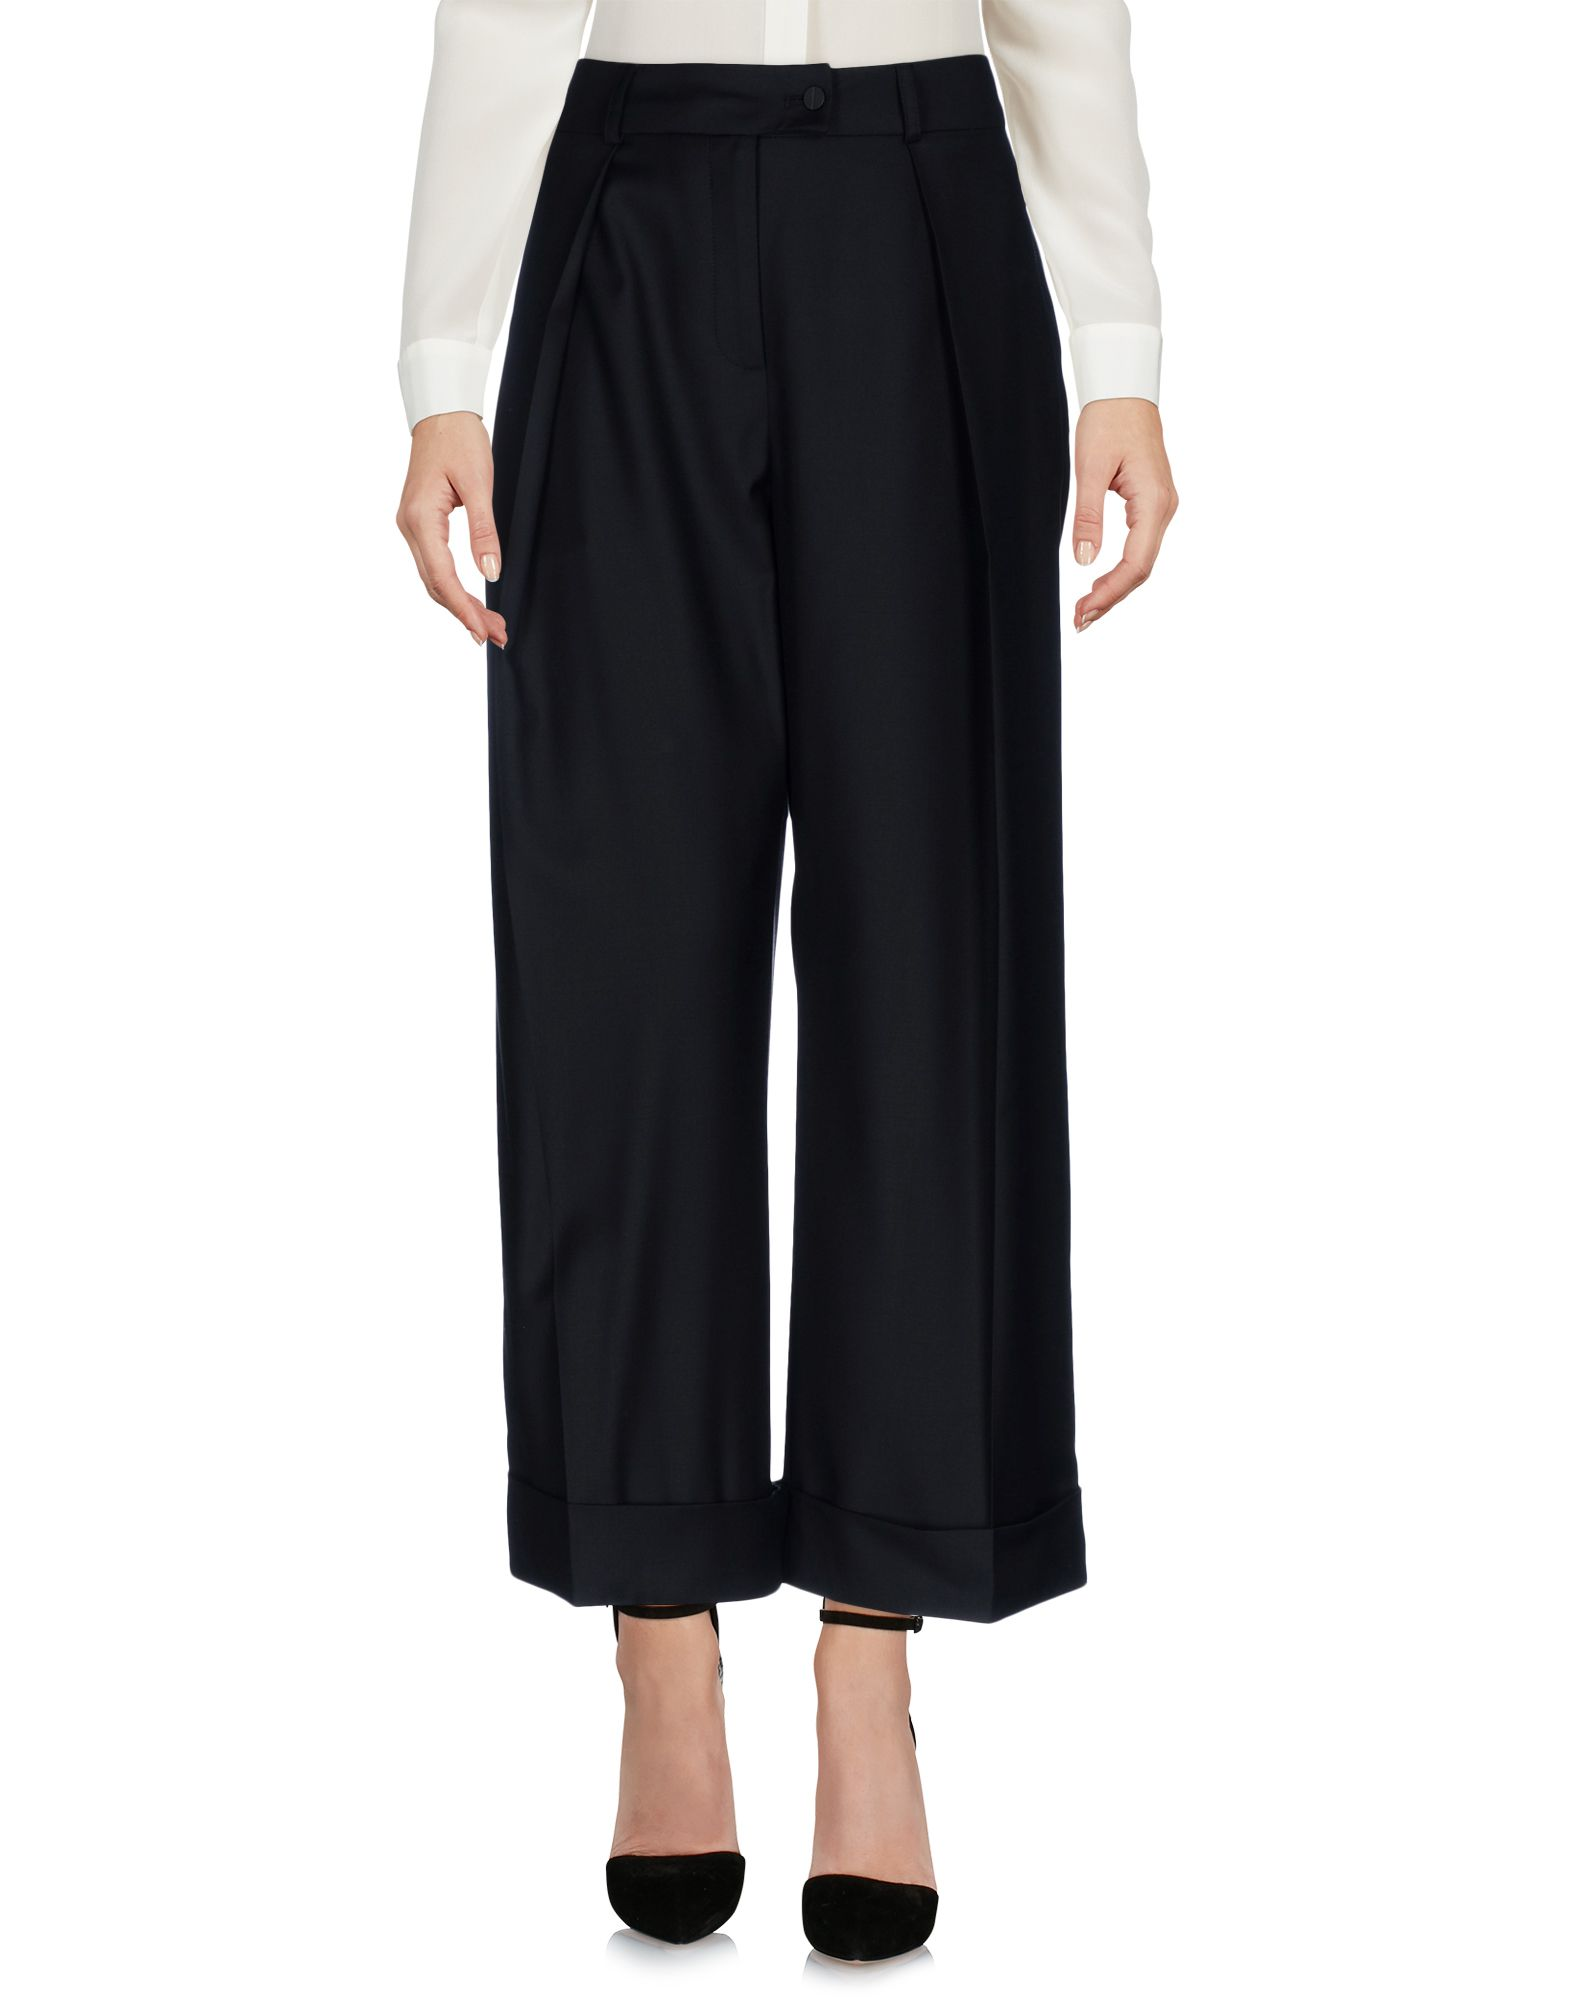 Pantalone Preen By Thornton Bregazzi Donna - Acquista online su O4LiYvGNPM